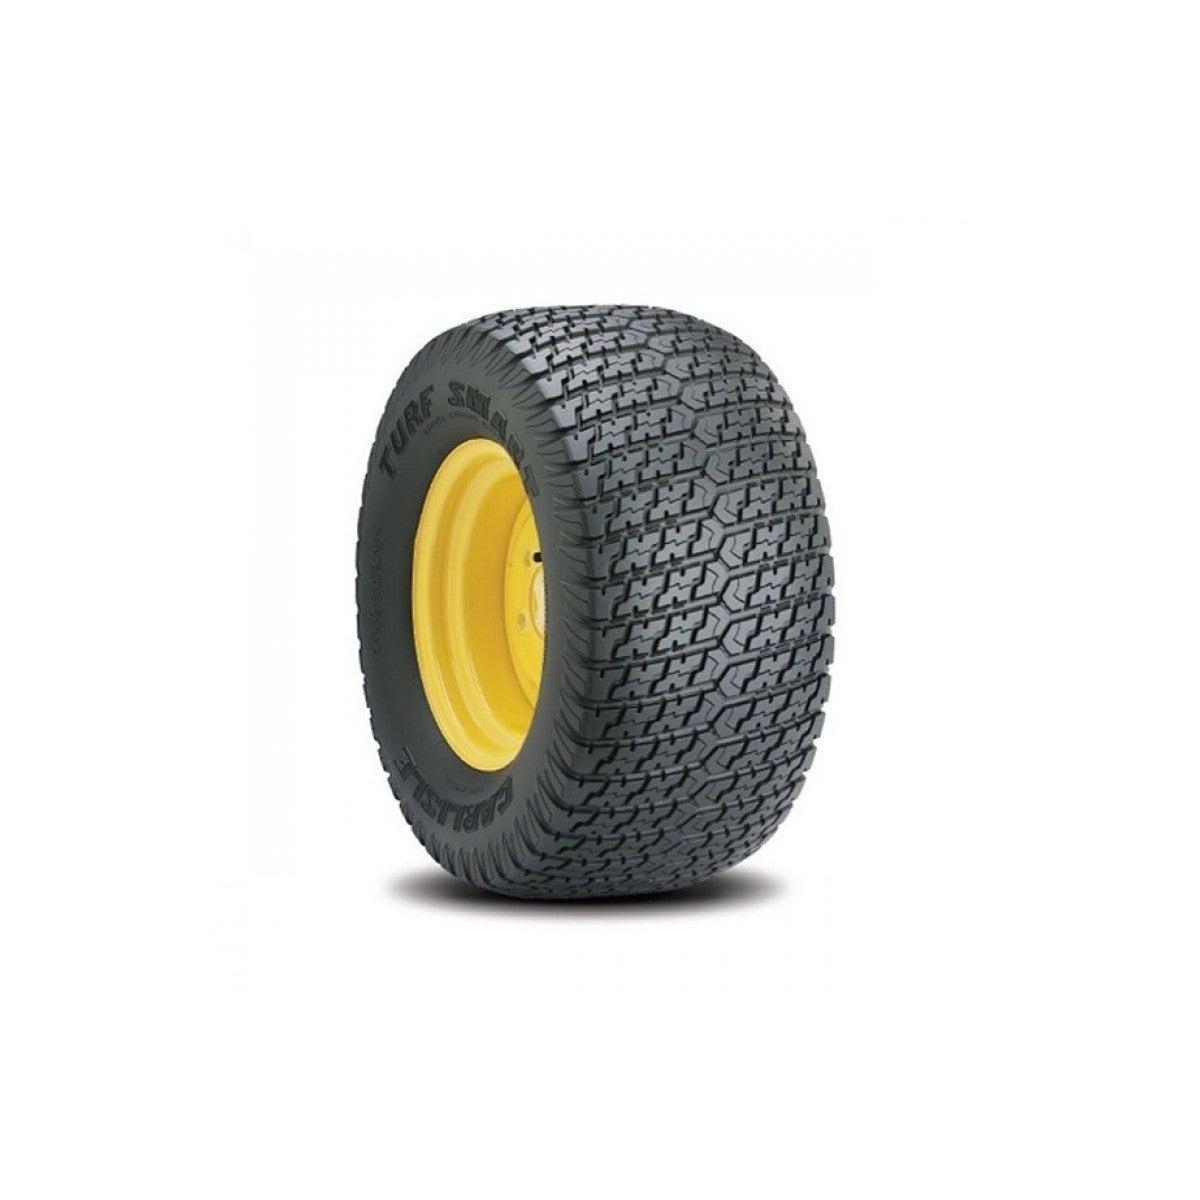 Carlisle Turf Smart Lawn & Garden Tire - 20X1000-10 LRB/4...